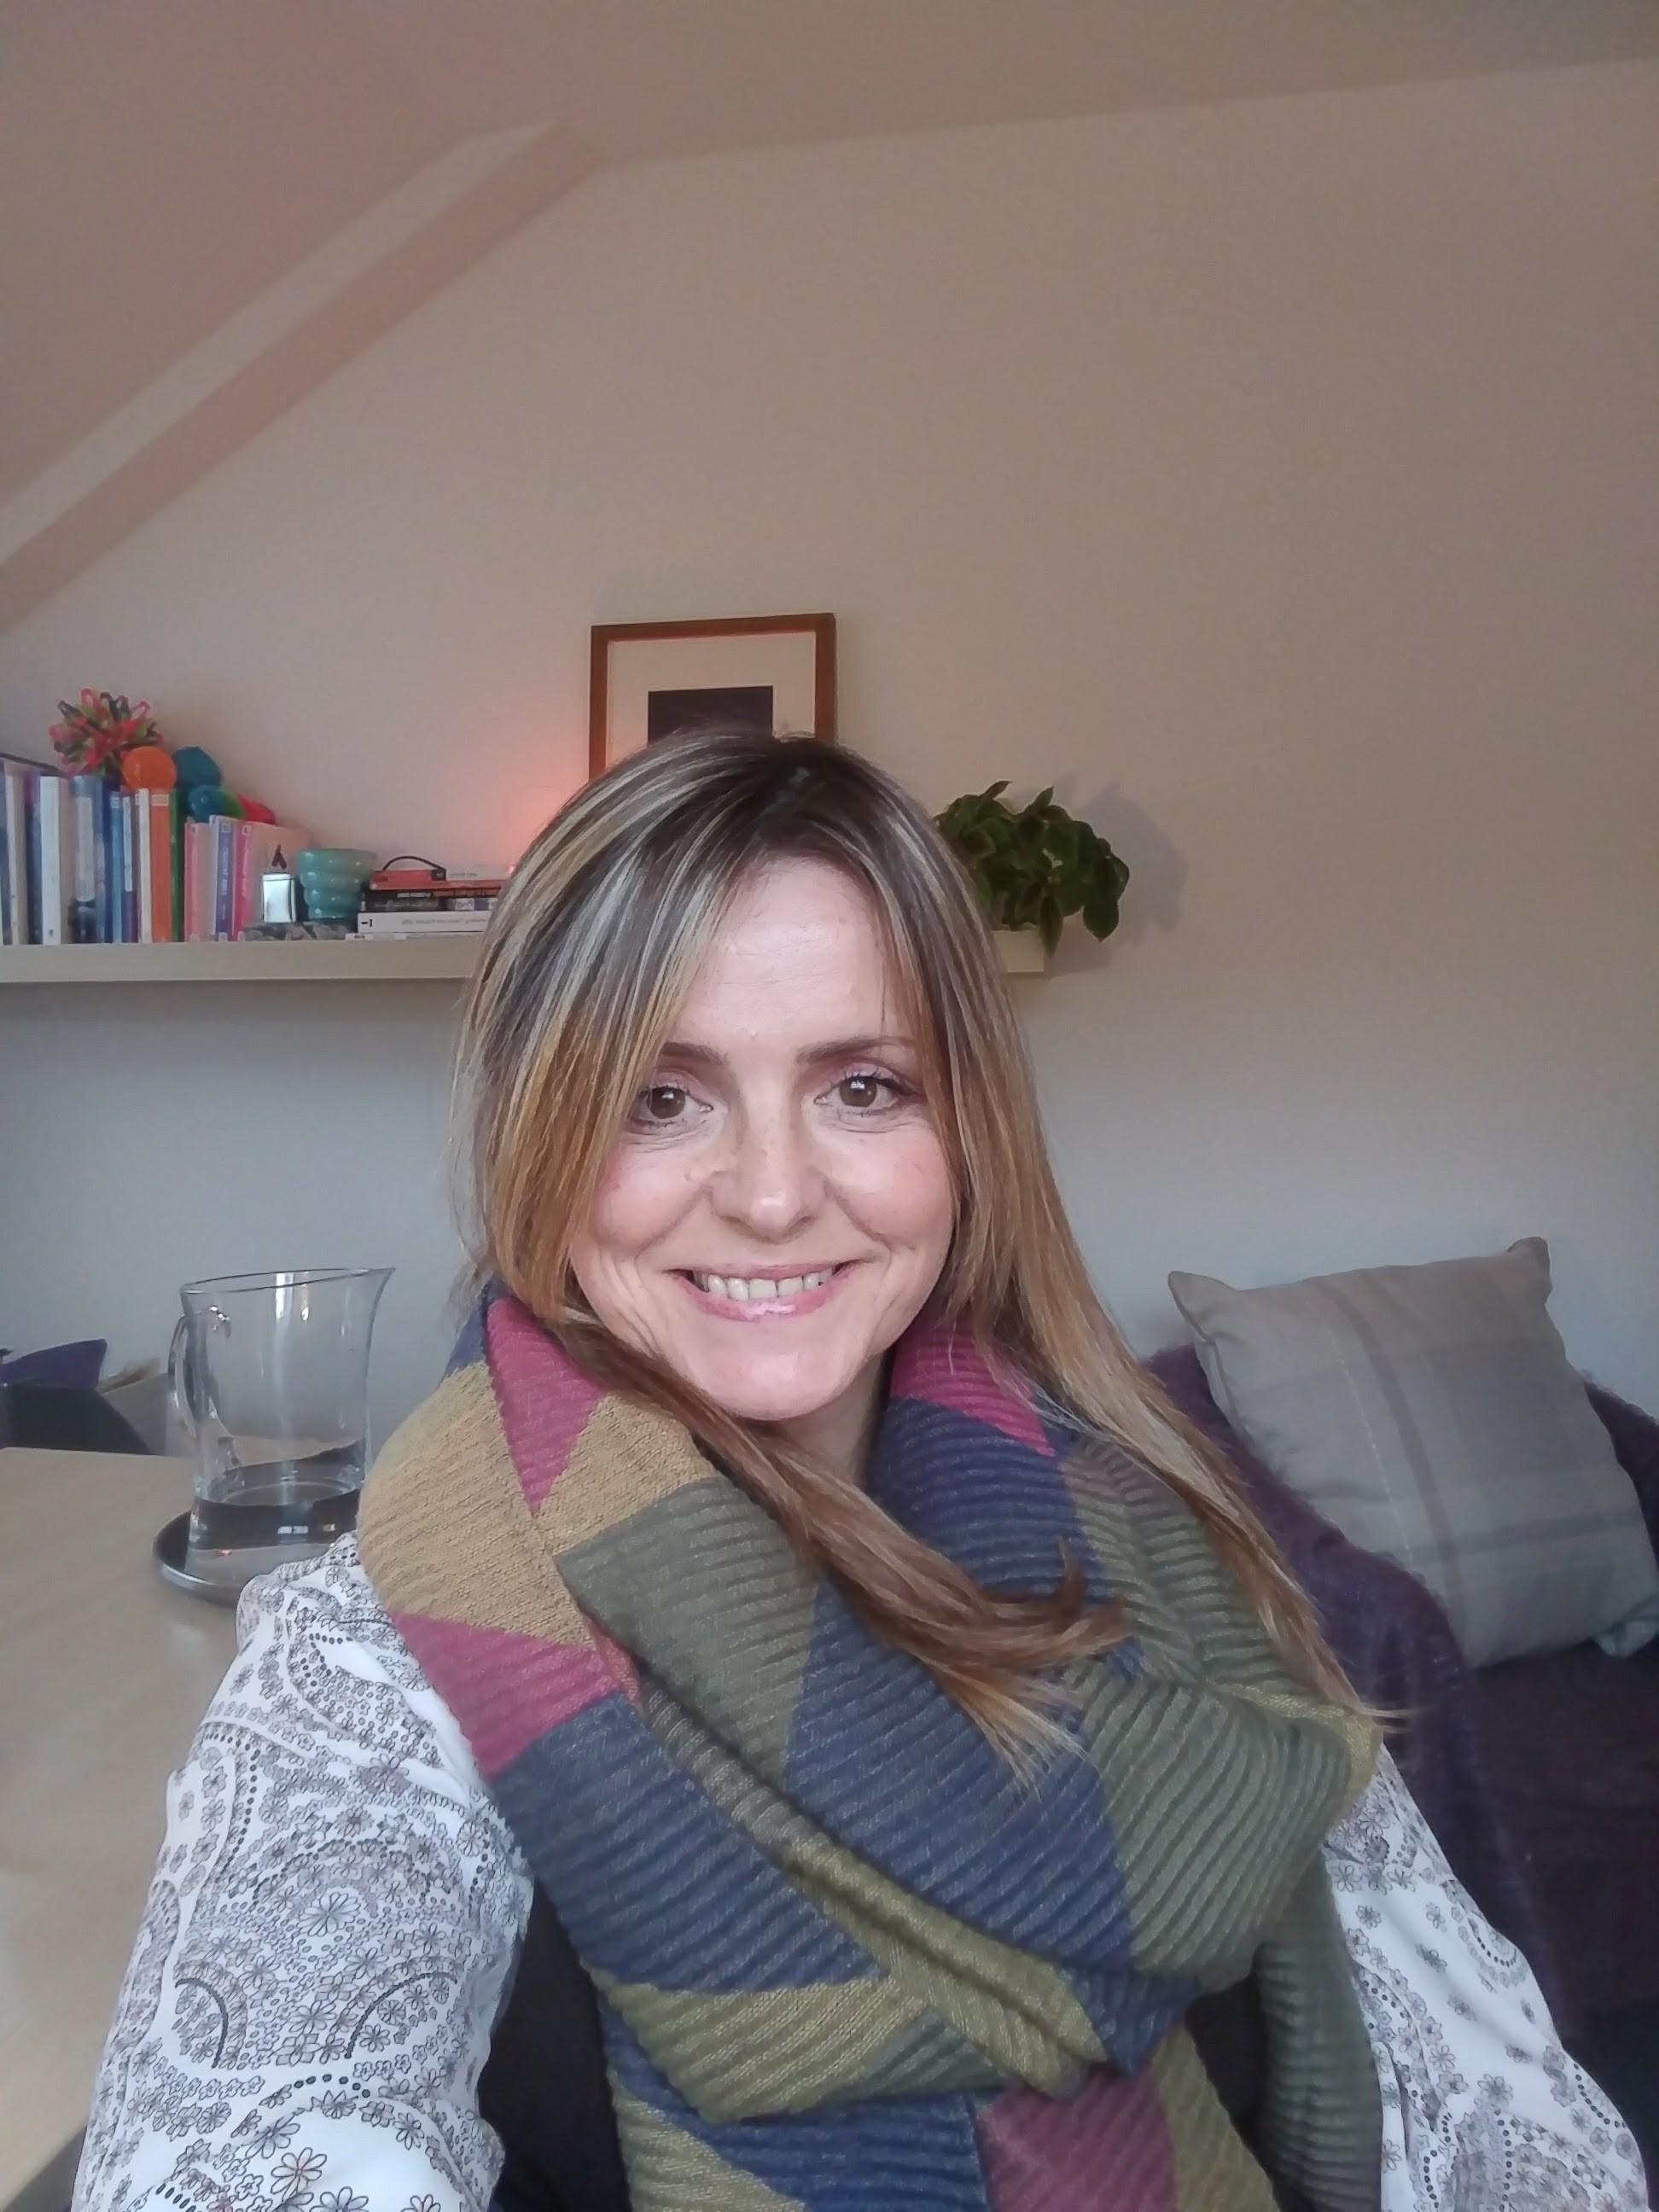 Toni-Clare Morrison